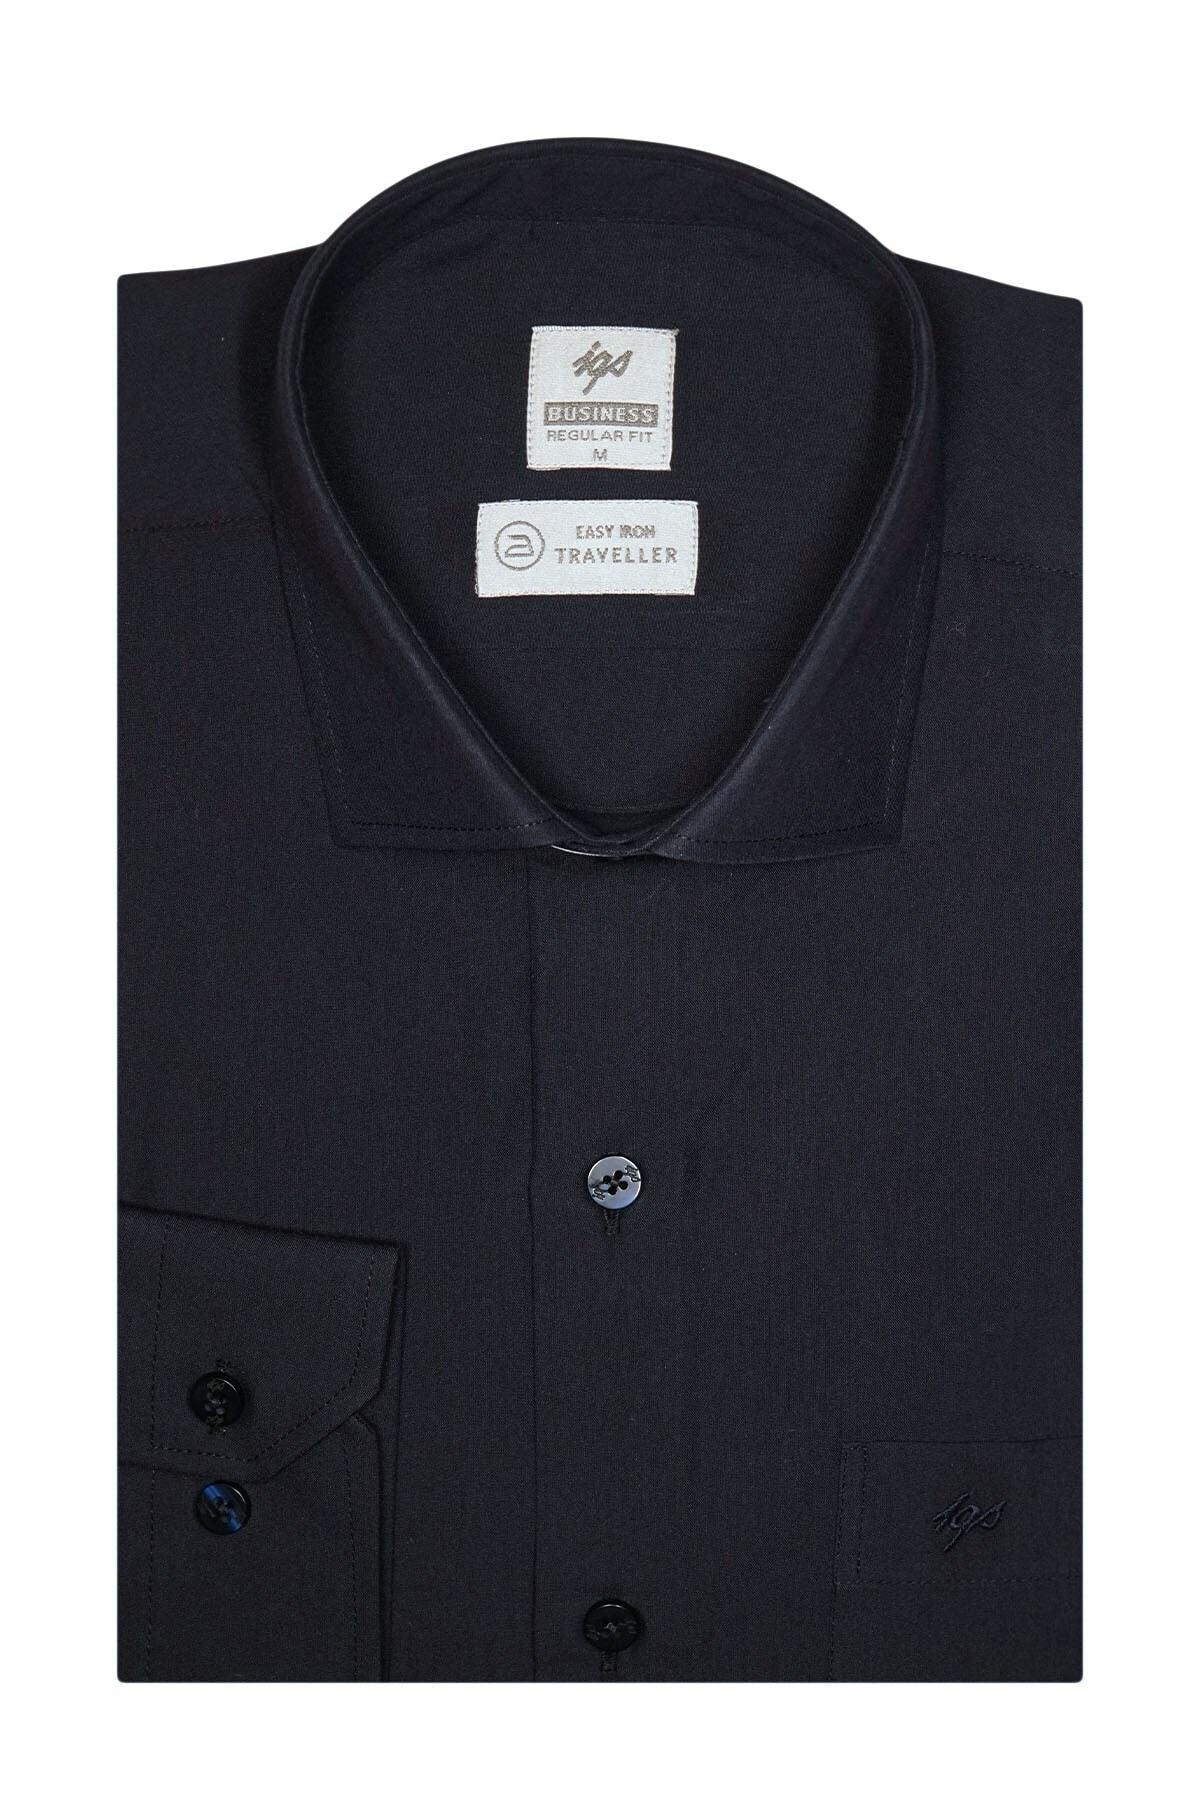 İgs Erkek Lacivert Regularfıt / Rahat Kalıp 7 Cm Klasik Gömlek 1